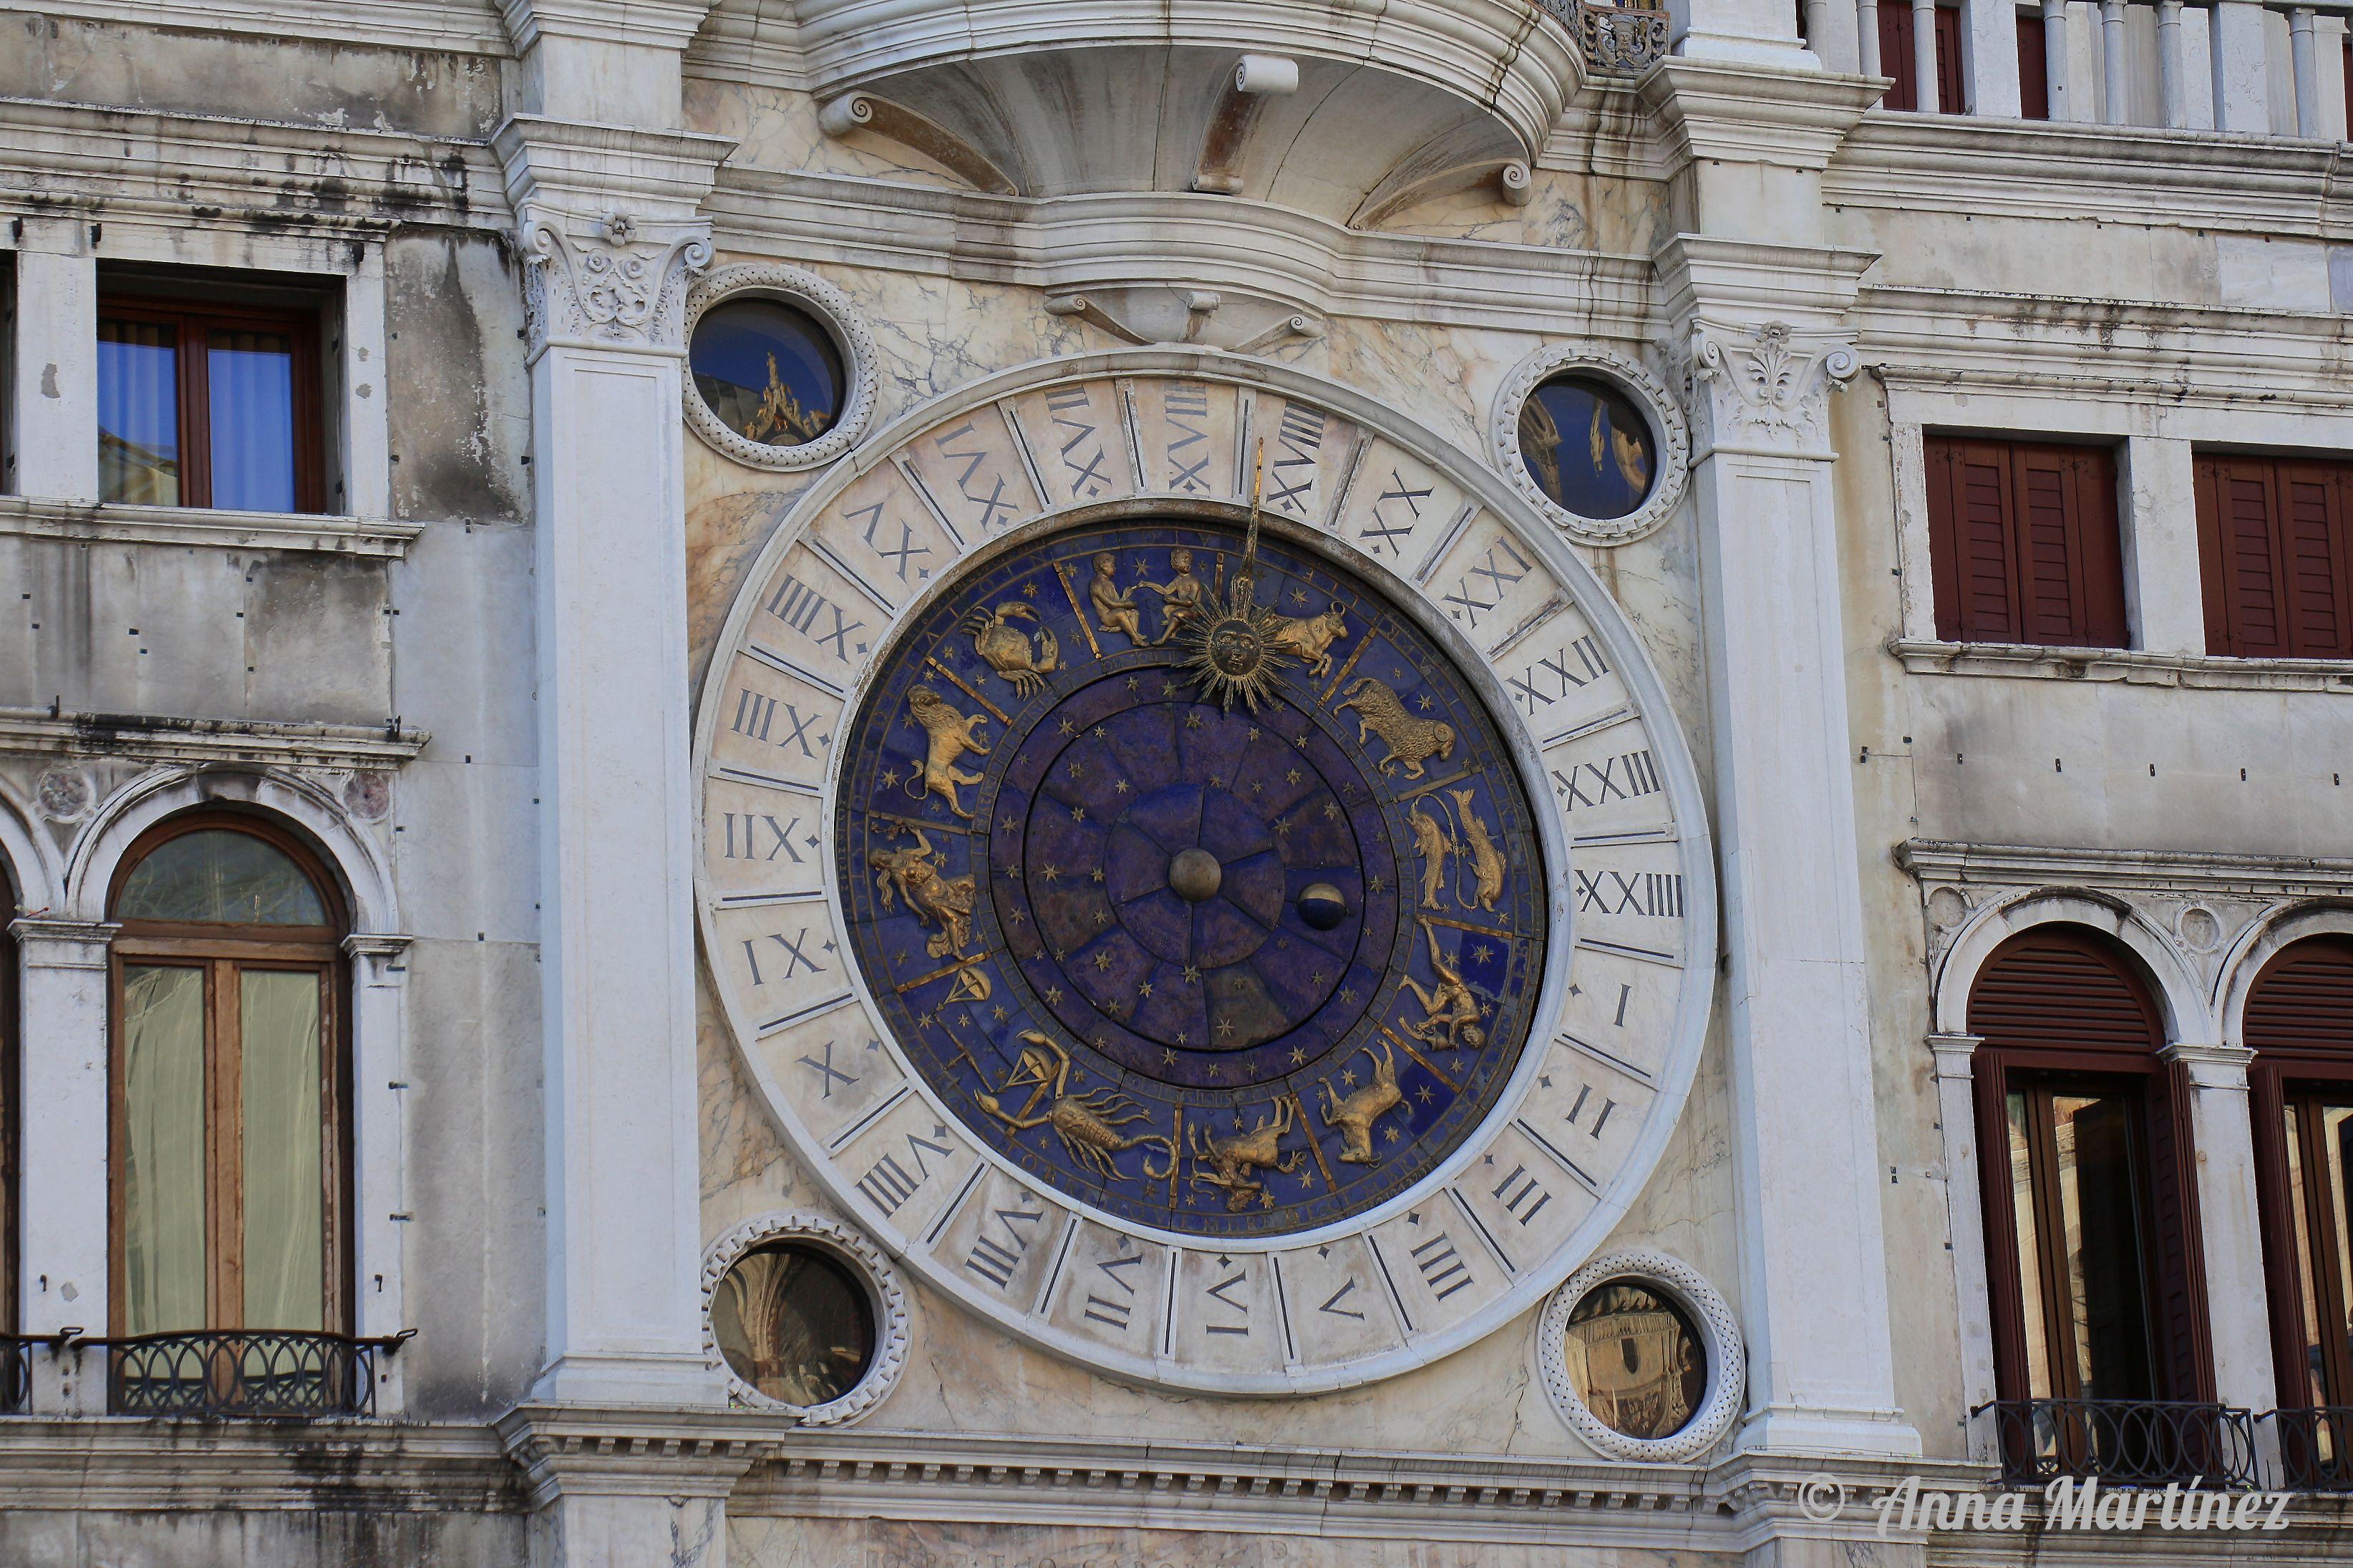 Piazza San Marco Venice, Italy 2015